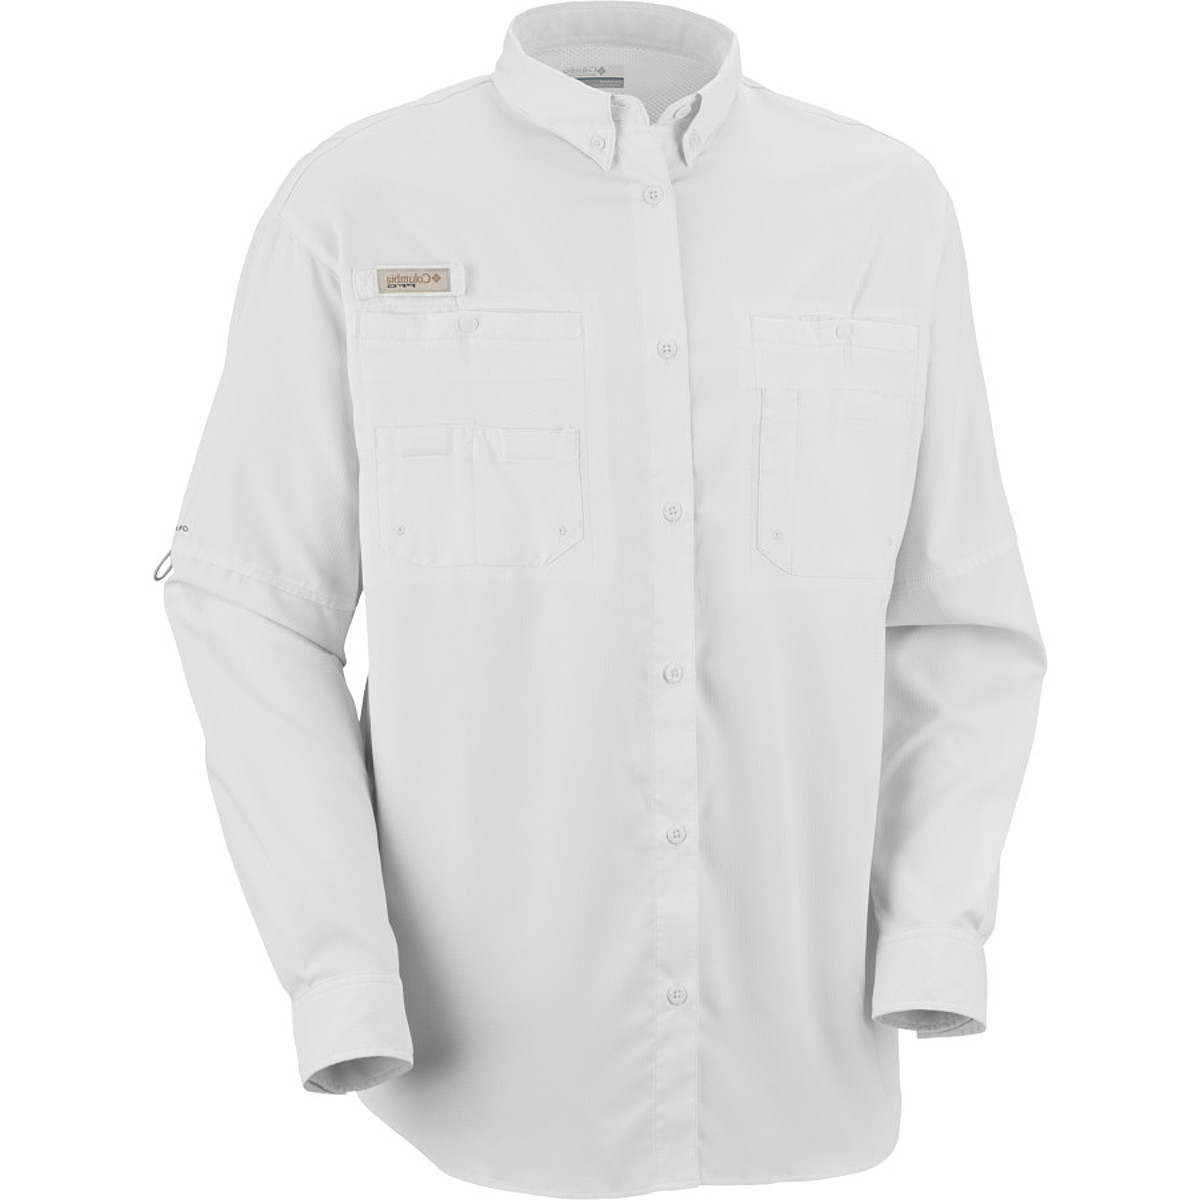 Columbia Tamiami II Button-Down Shirt - Men's